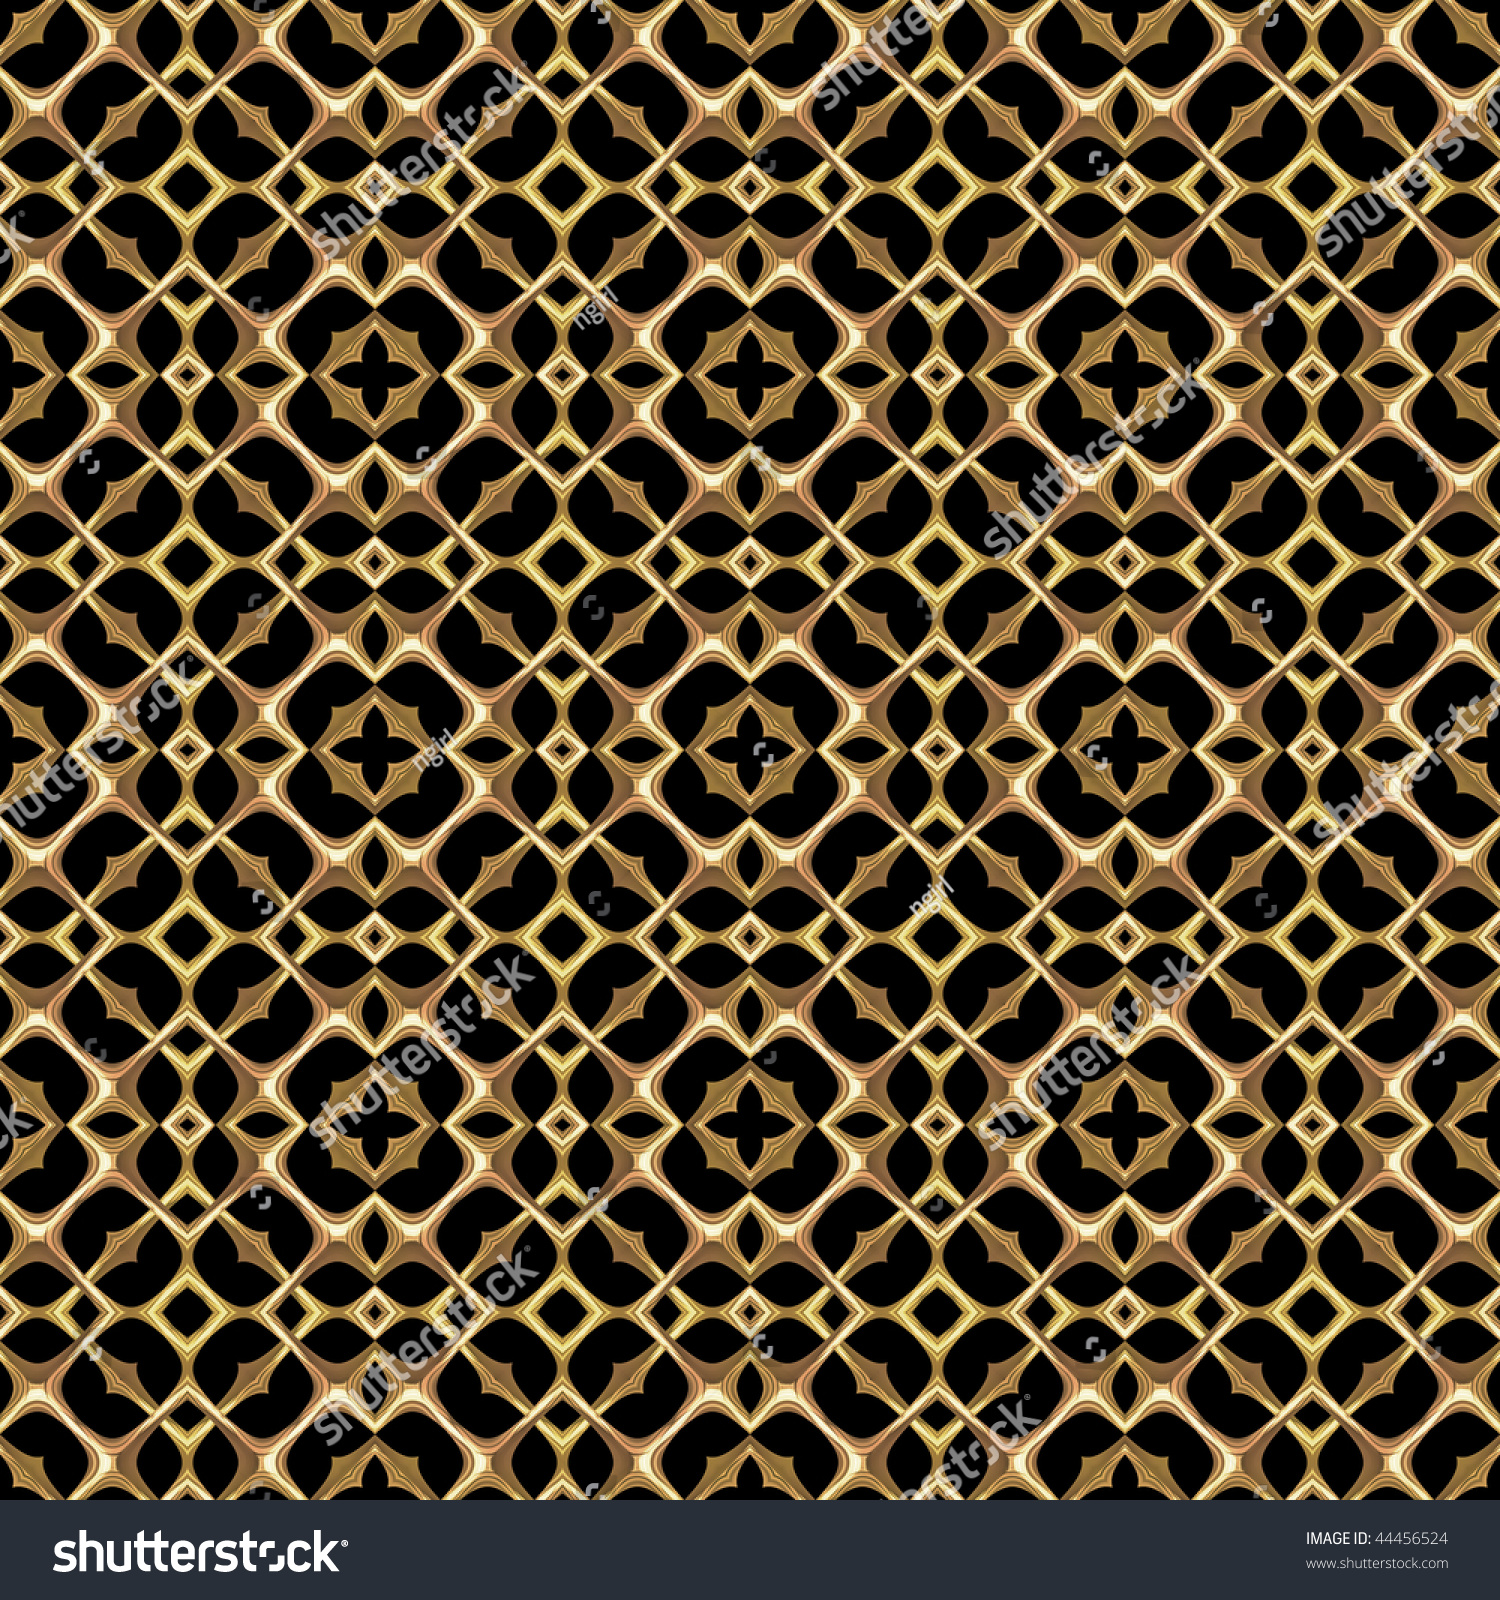 Decorative Metal Grates Gold Decorative Grill Grate Seamless Background Stock Illustration